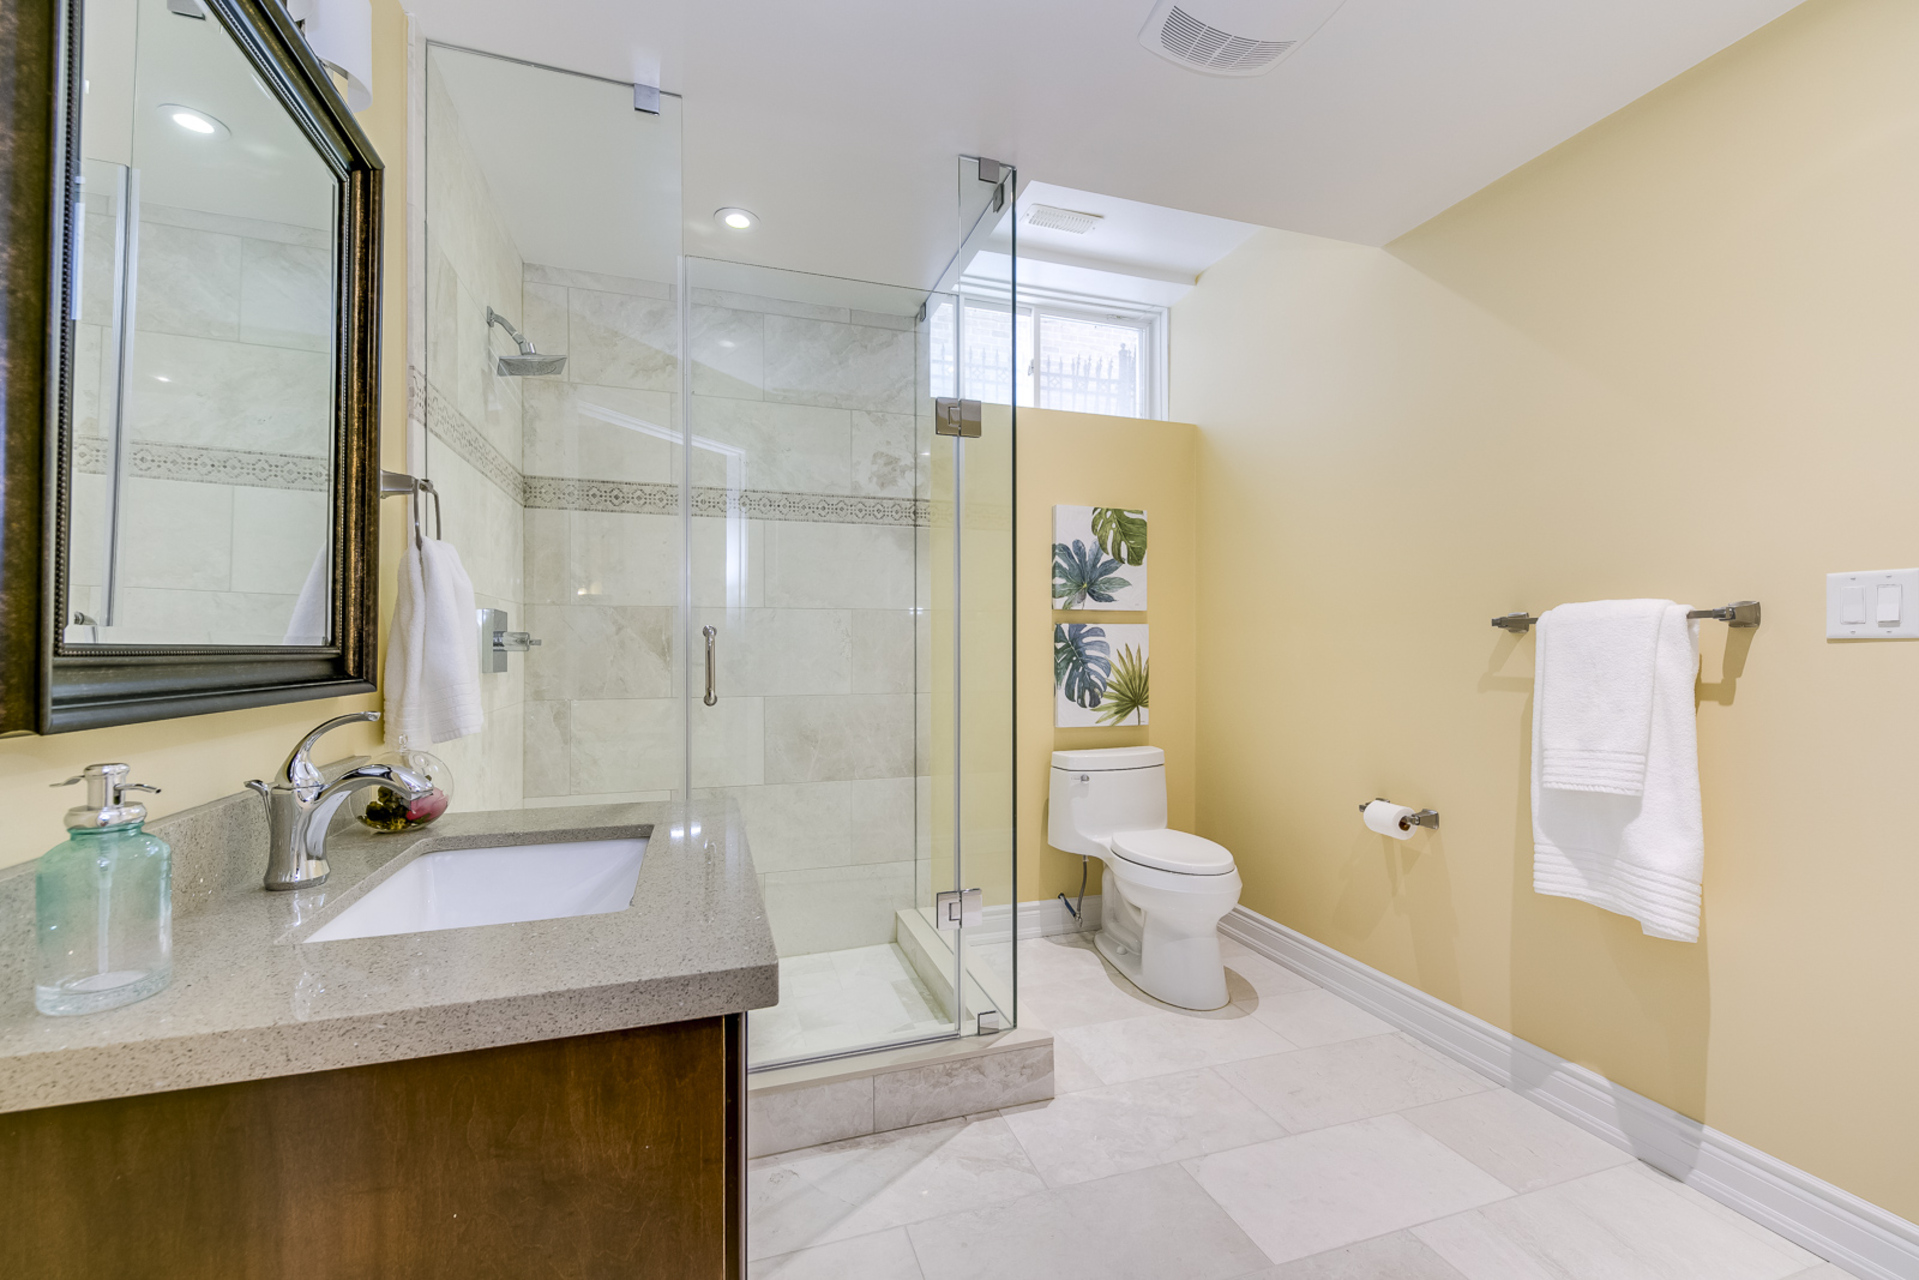 Basement Bathroom - 725 Queensway W, Mississauga - Elite3 & Team at 725 Queensway West, Erindale, Mississauga